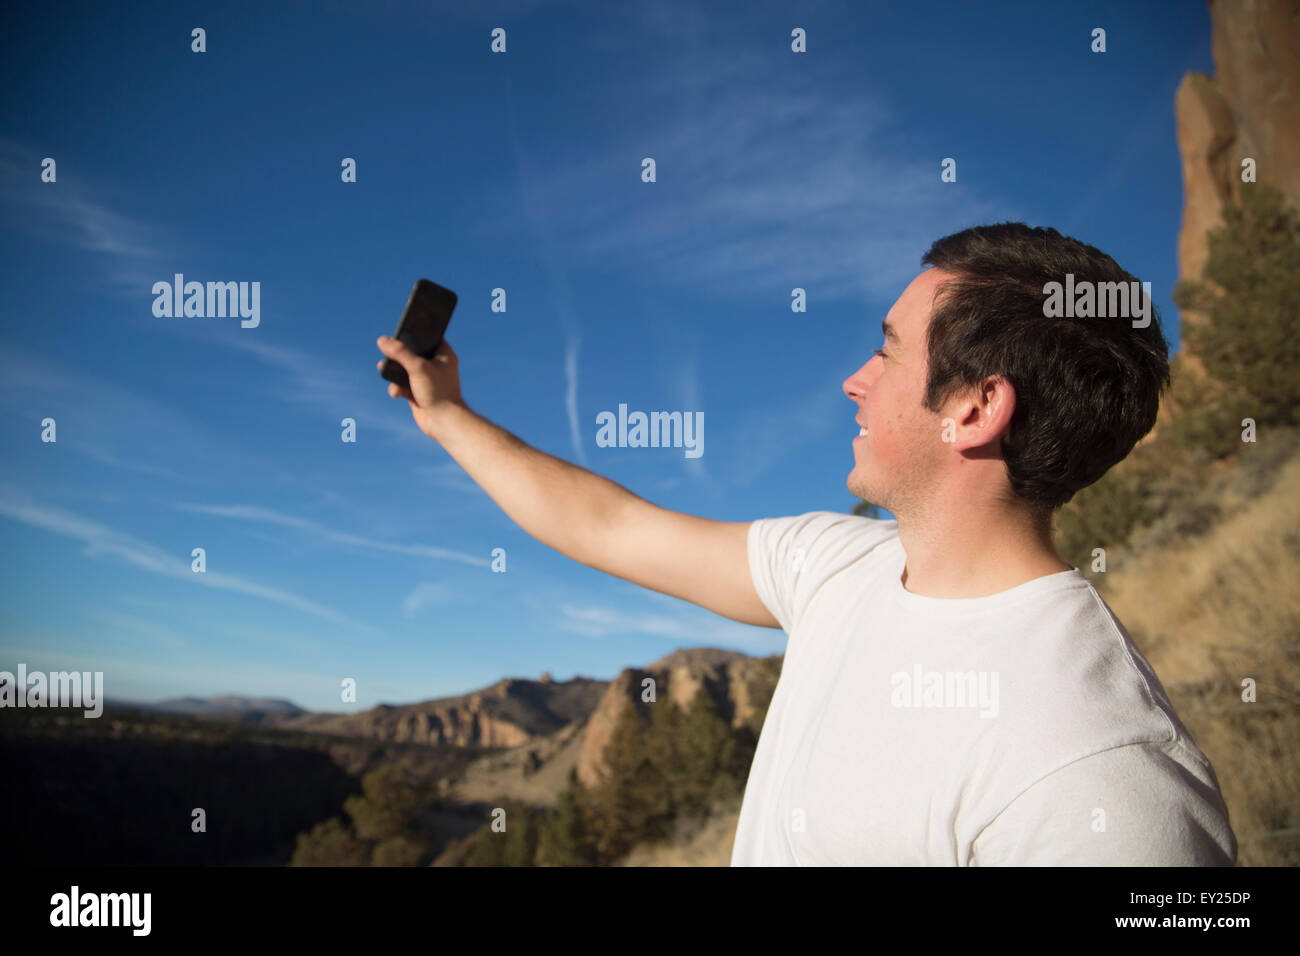 Hiker taking selfie, Smith Rock State Park, Oregon, US - Stock Image